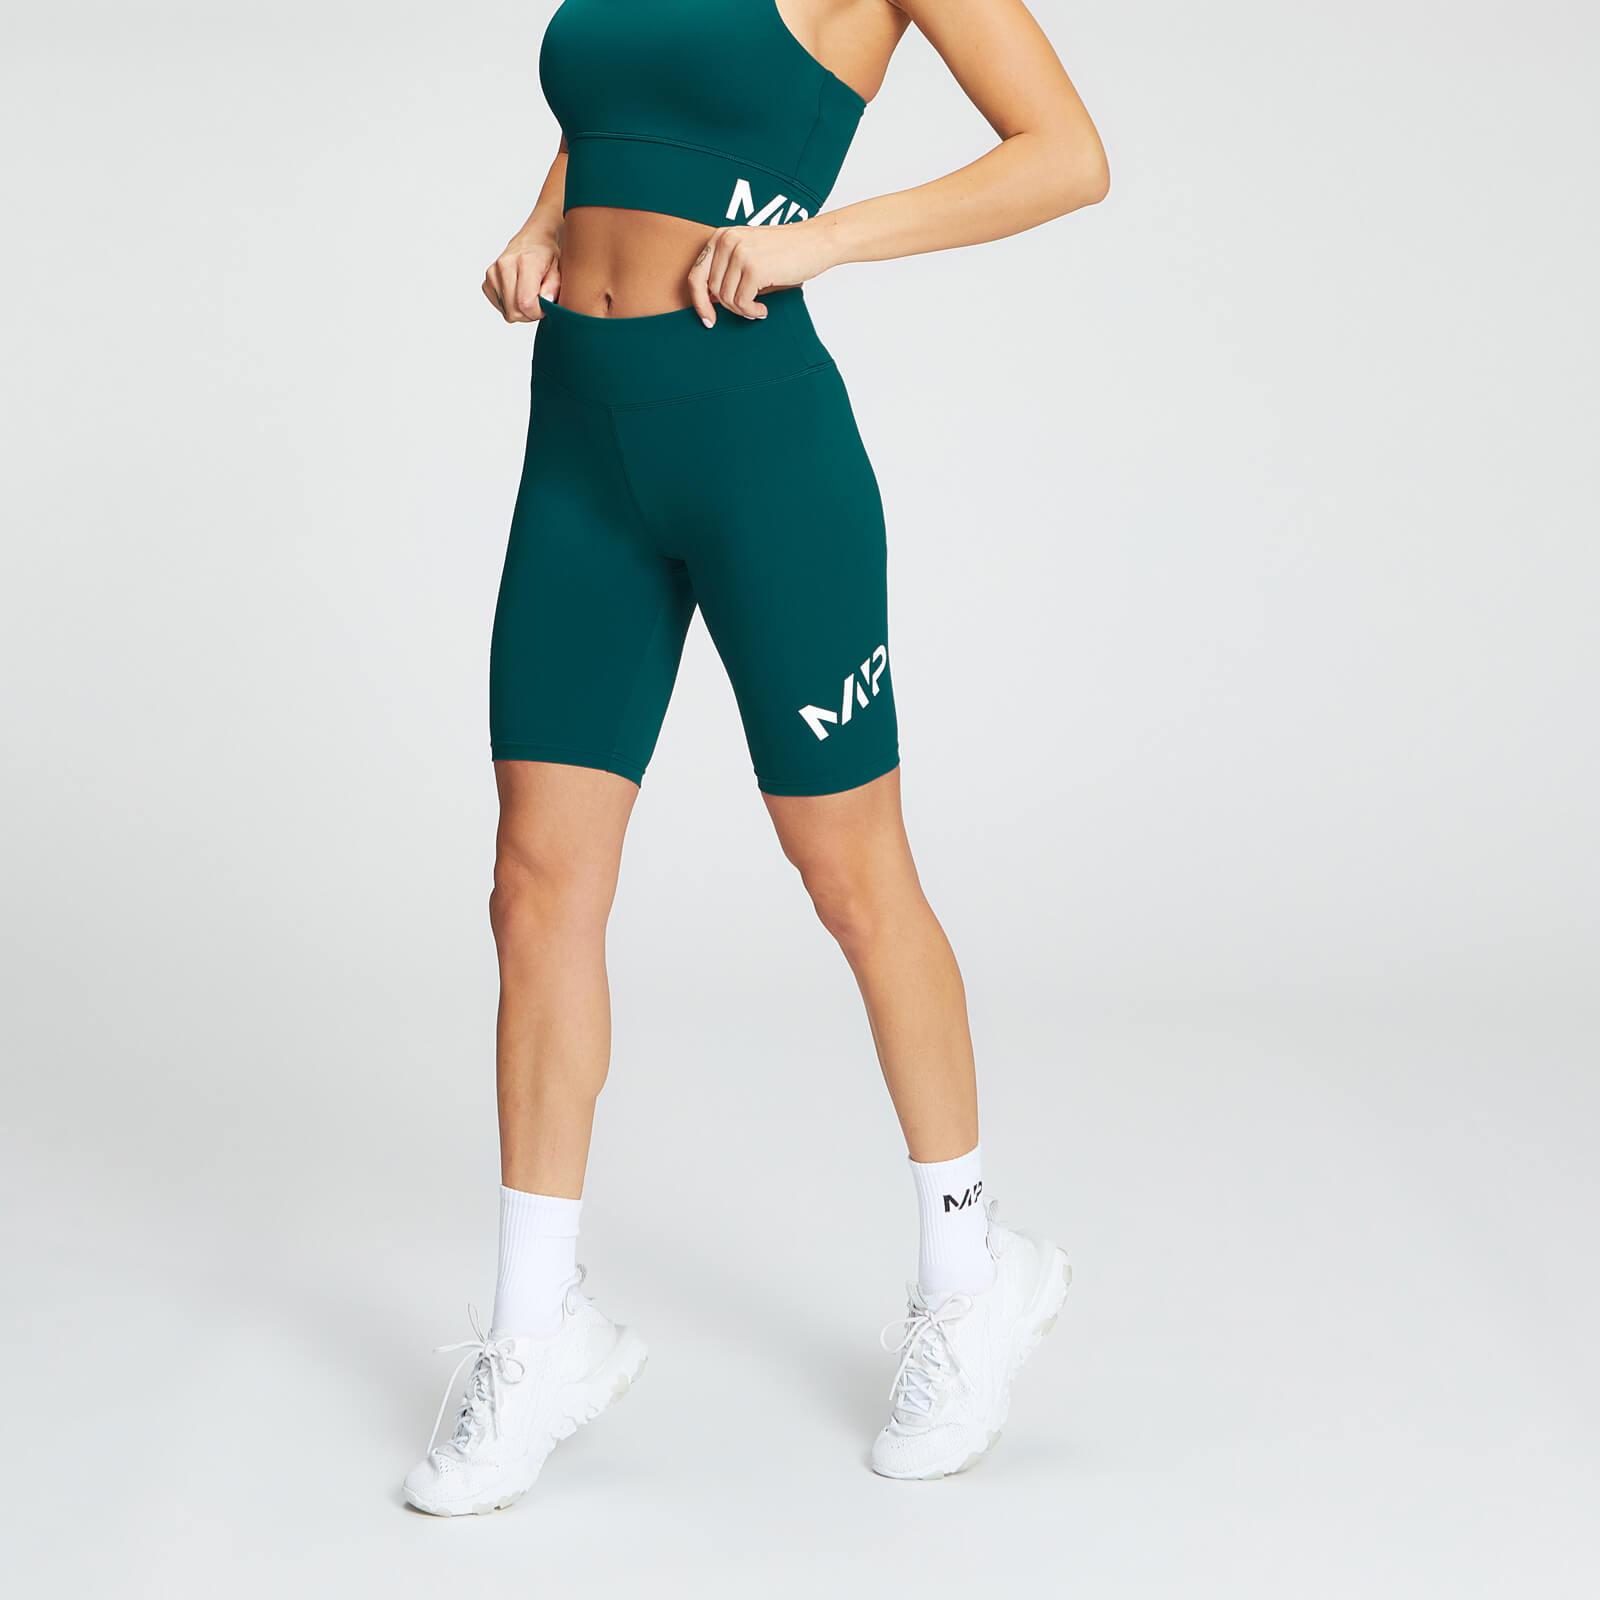 Купить MP Essentials Training Women's Full Length Cycling Short - Deep Teal - XXS, Myprotein International